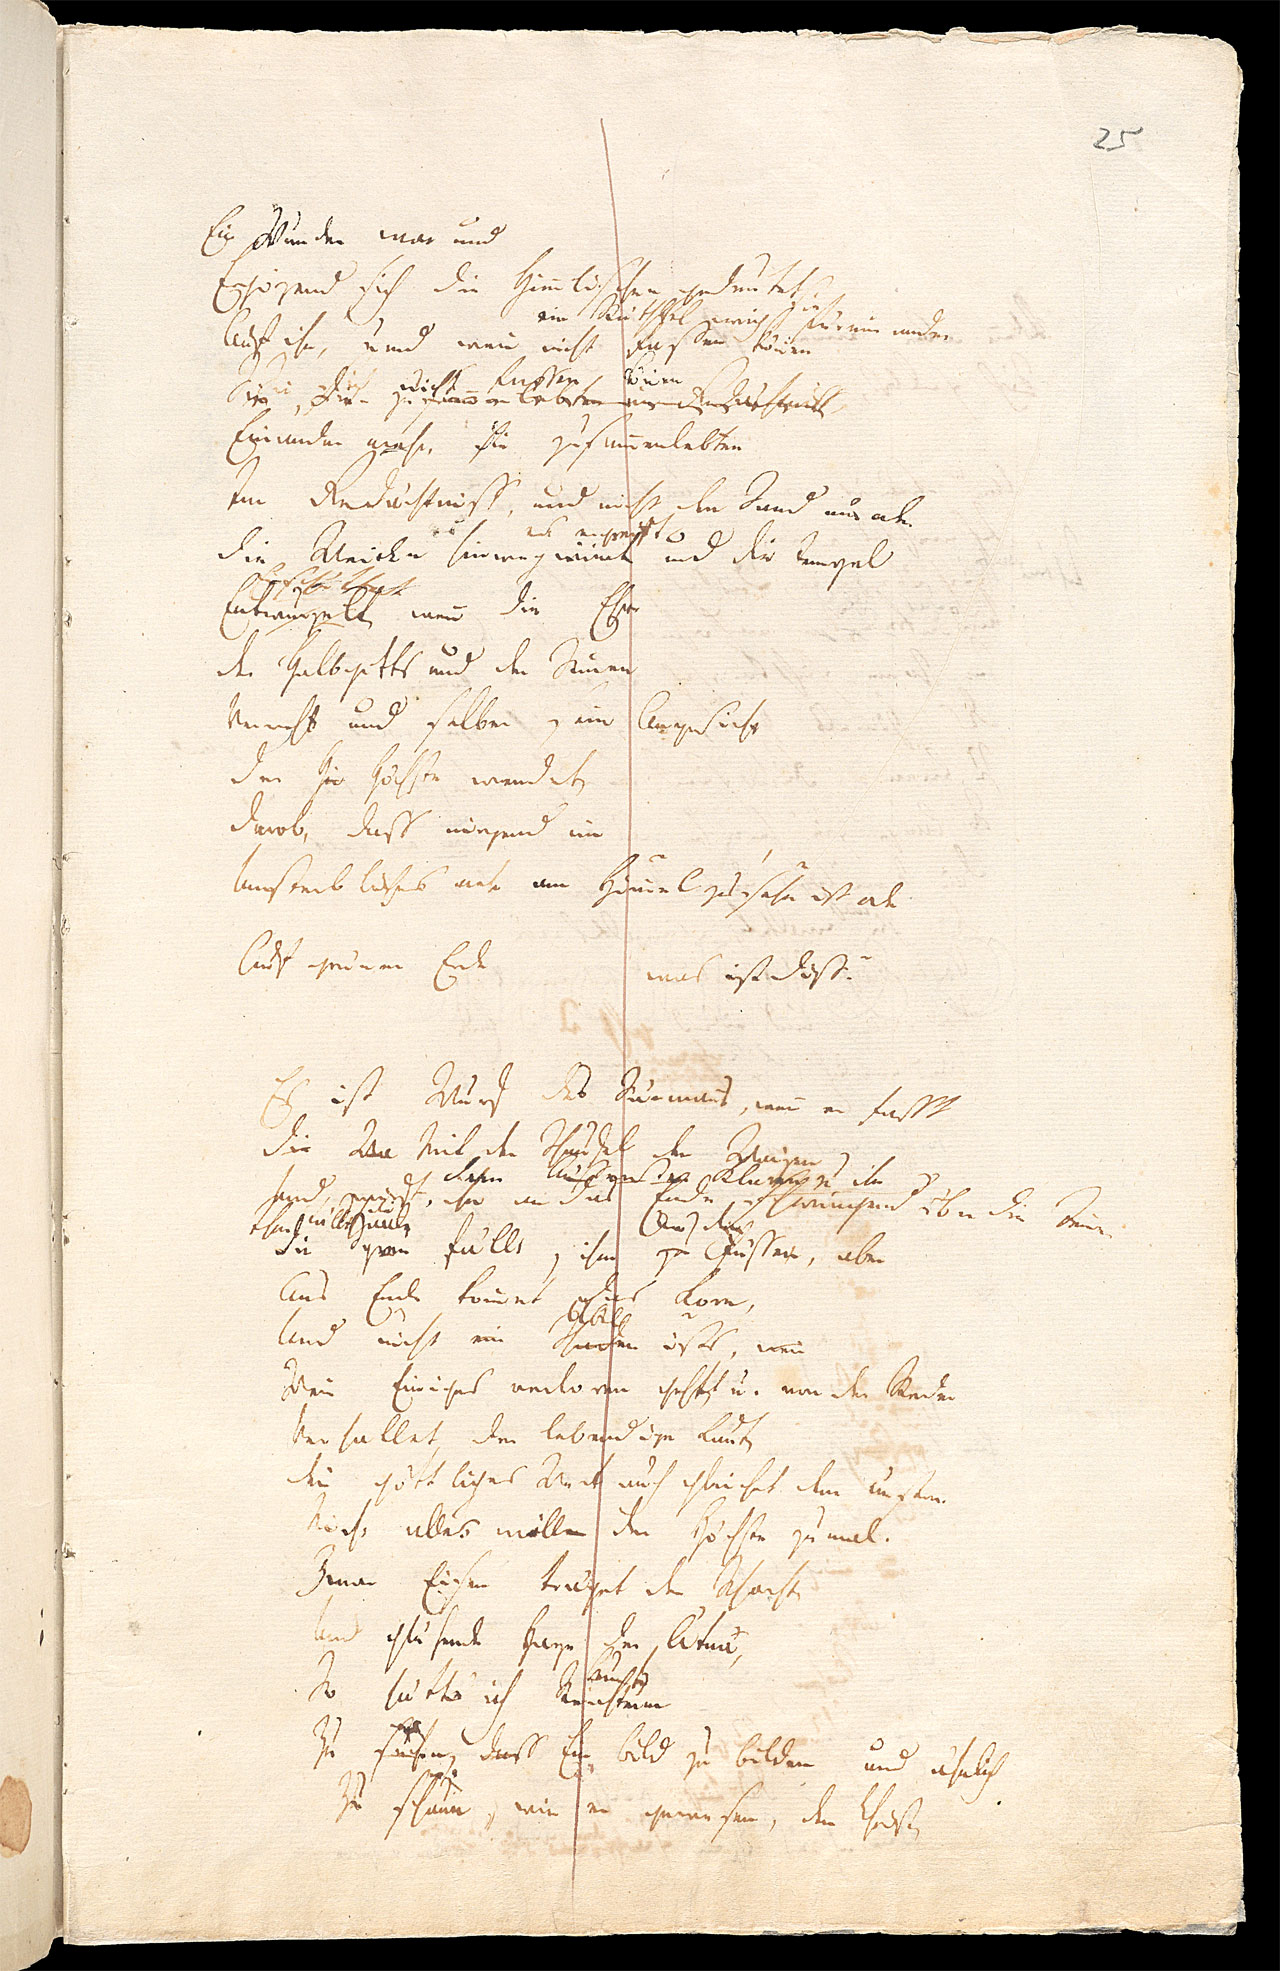 Friedrich Hölderlin, Homburger Folioheft, Seite 25, Patmos, Handschrift